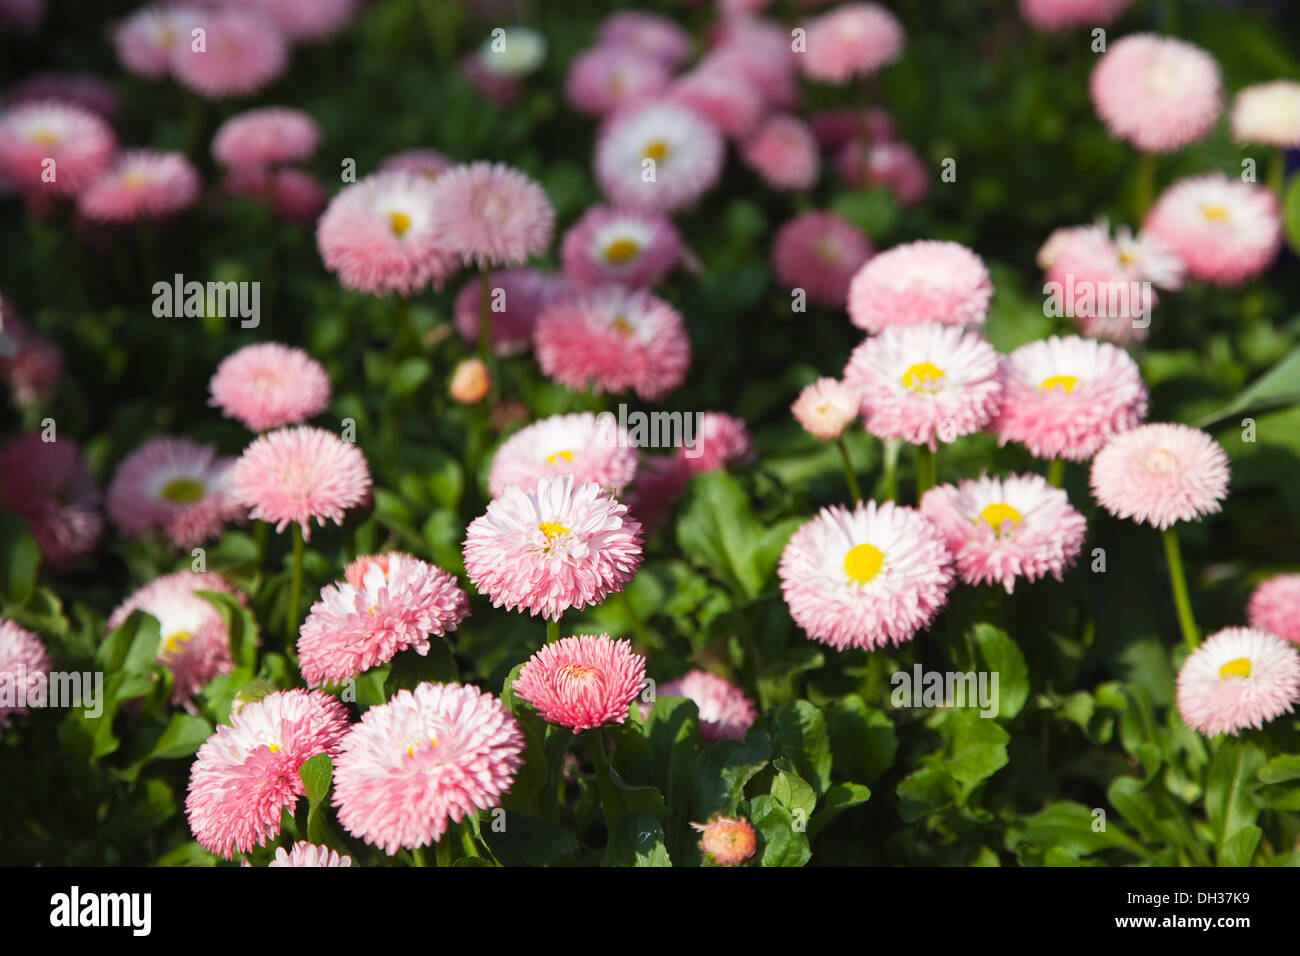 Daisy bellis perennis tasso series pink double flower heads of daisy bellis perennis tasso series pink double flower heads of perennial daisy carpeting area in public garden izmirmasajfo Image collections